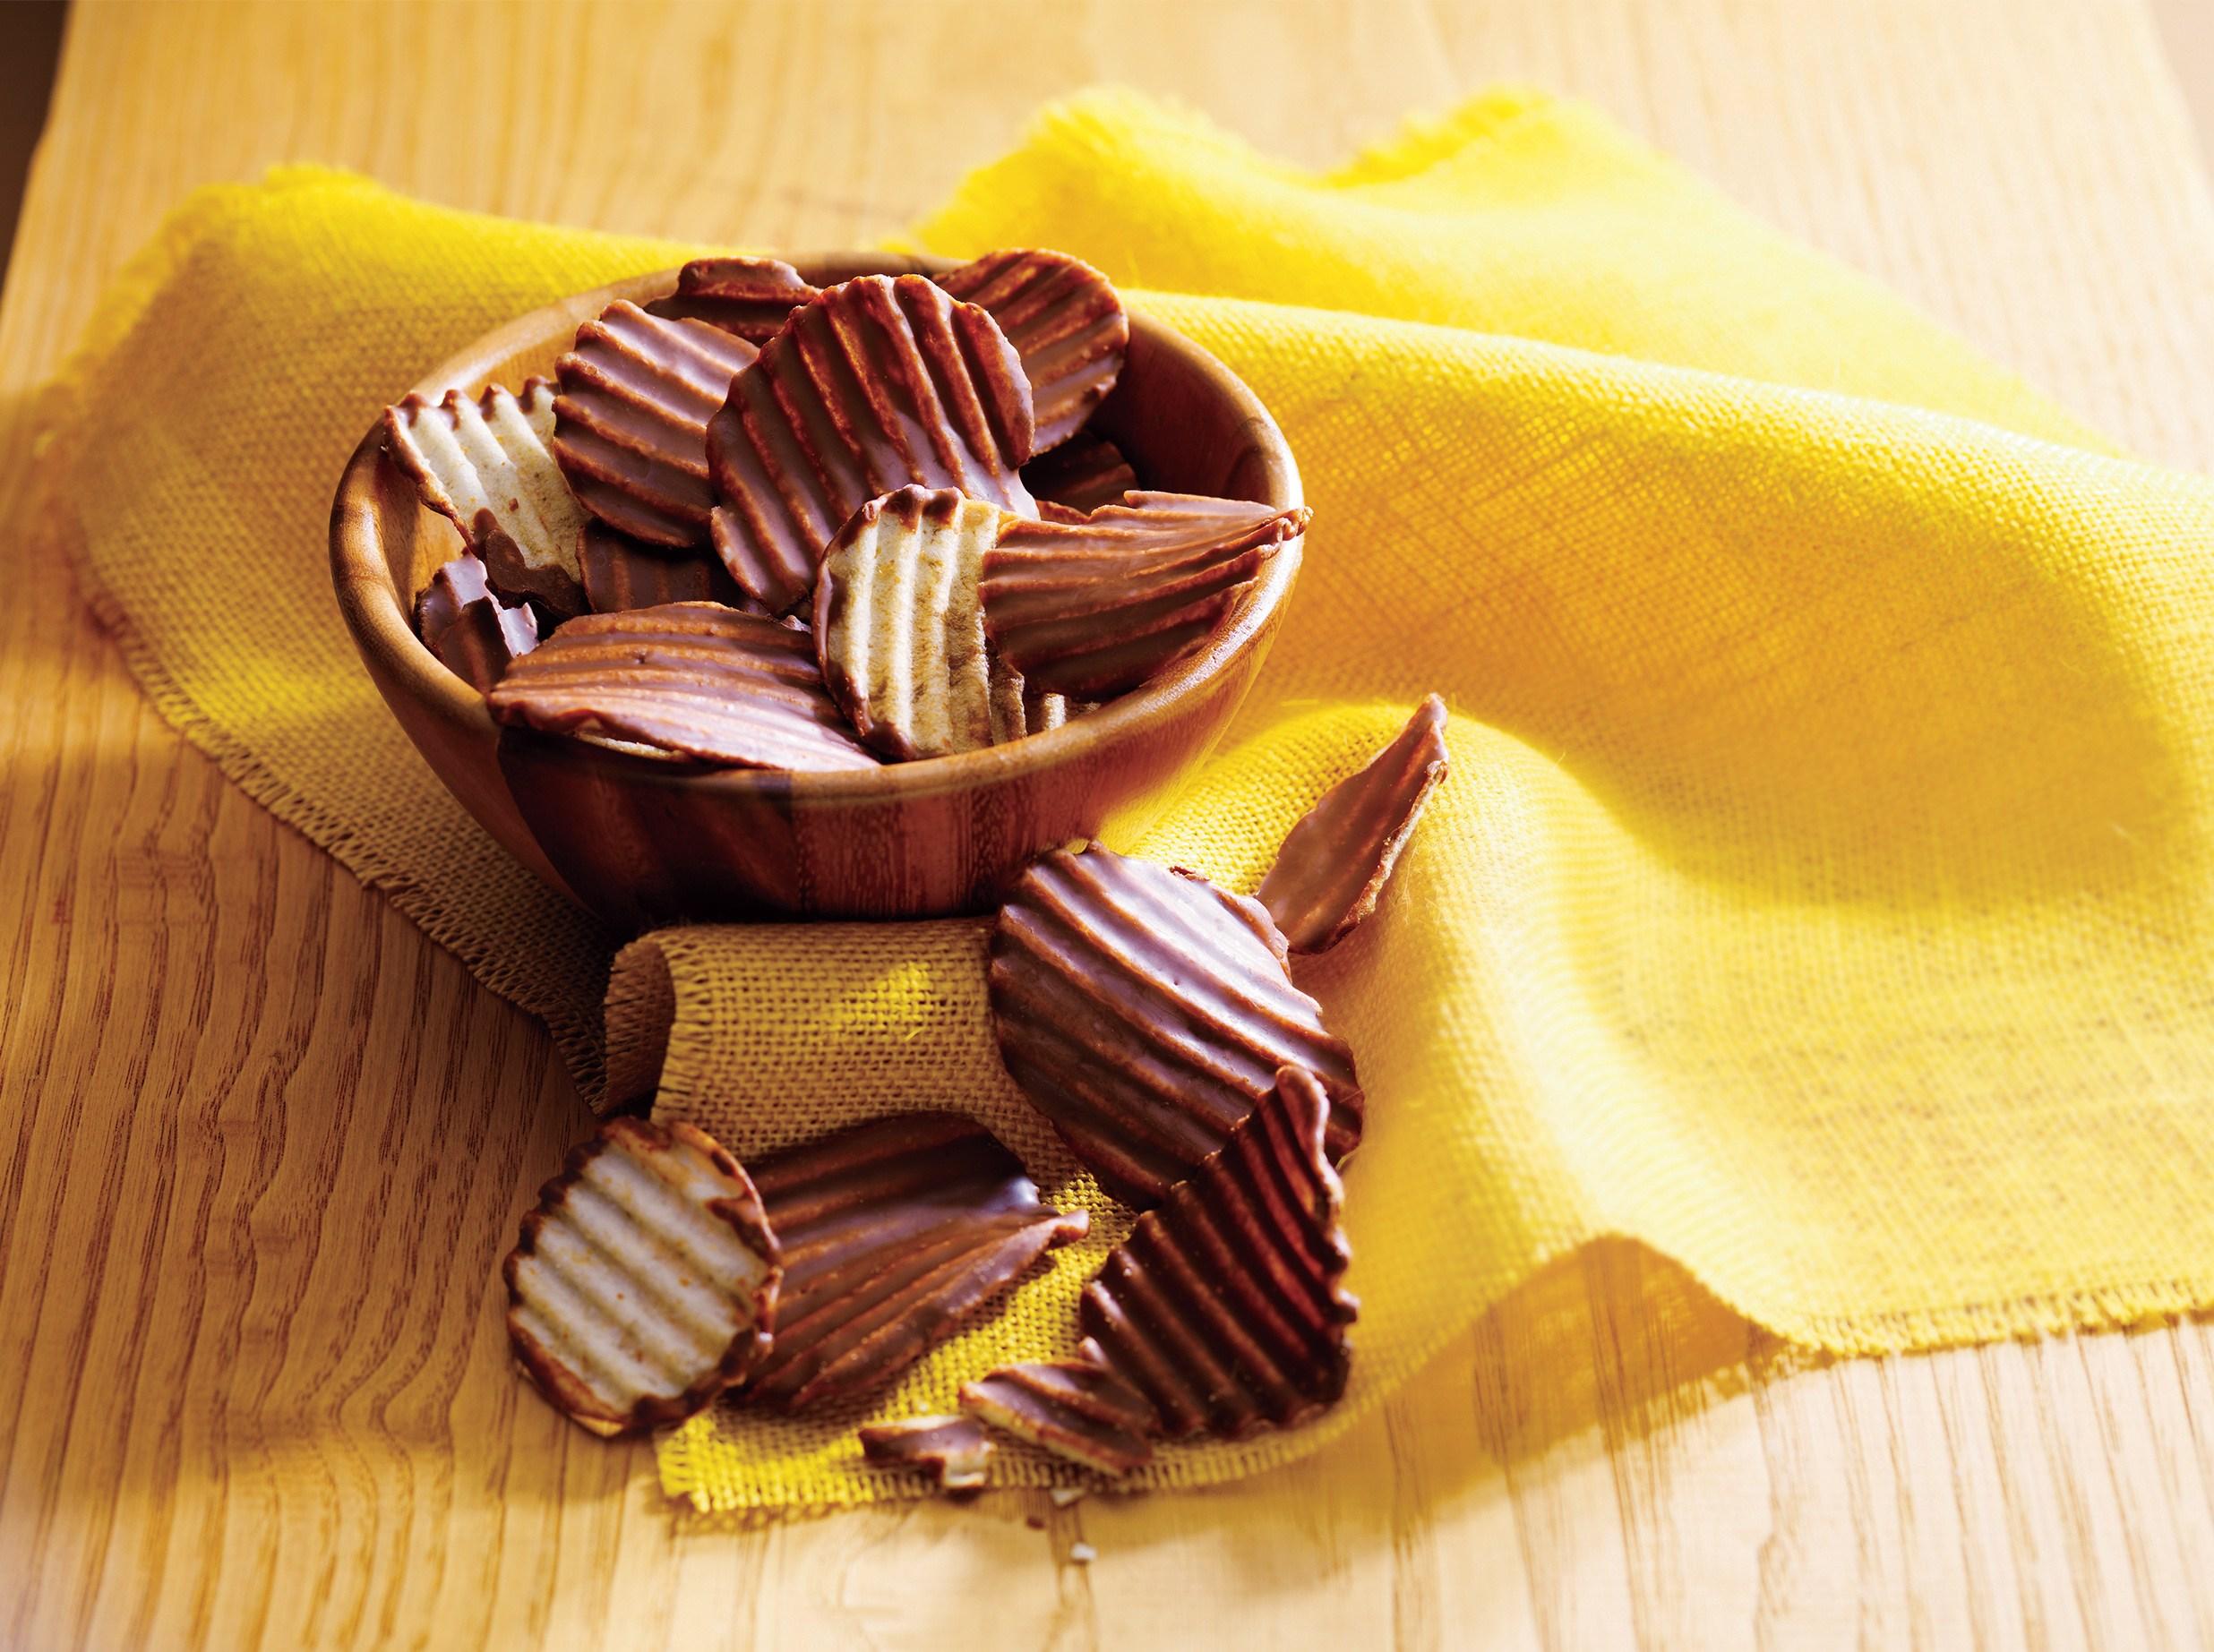 Chocolate of the world Kirkland